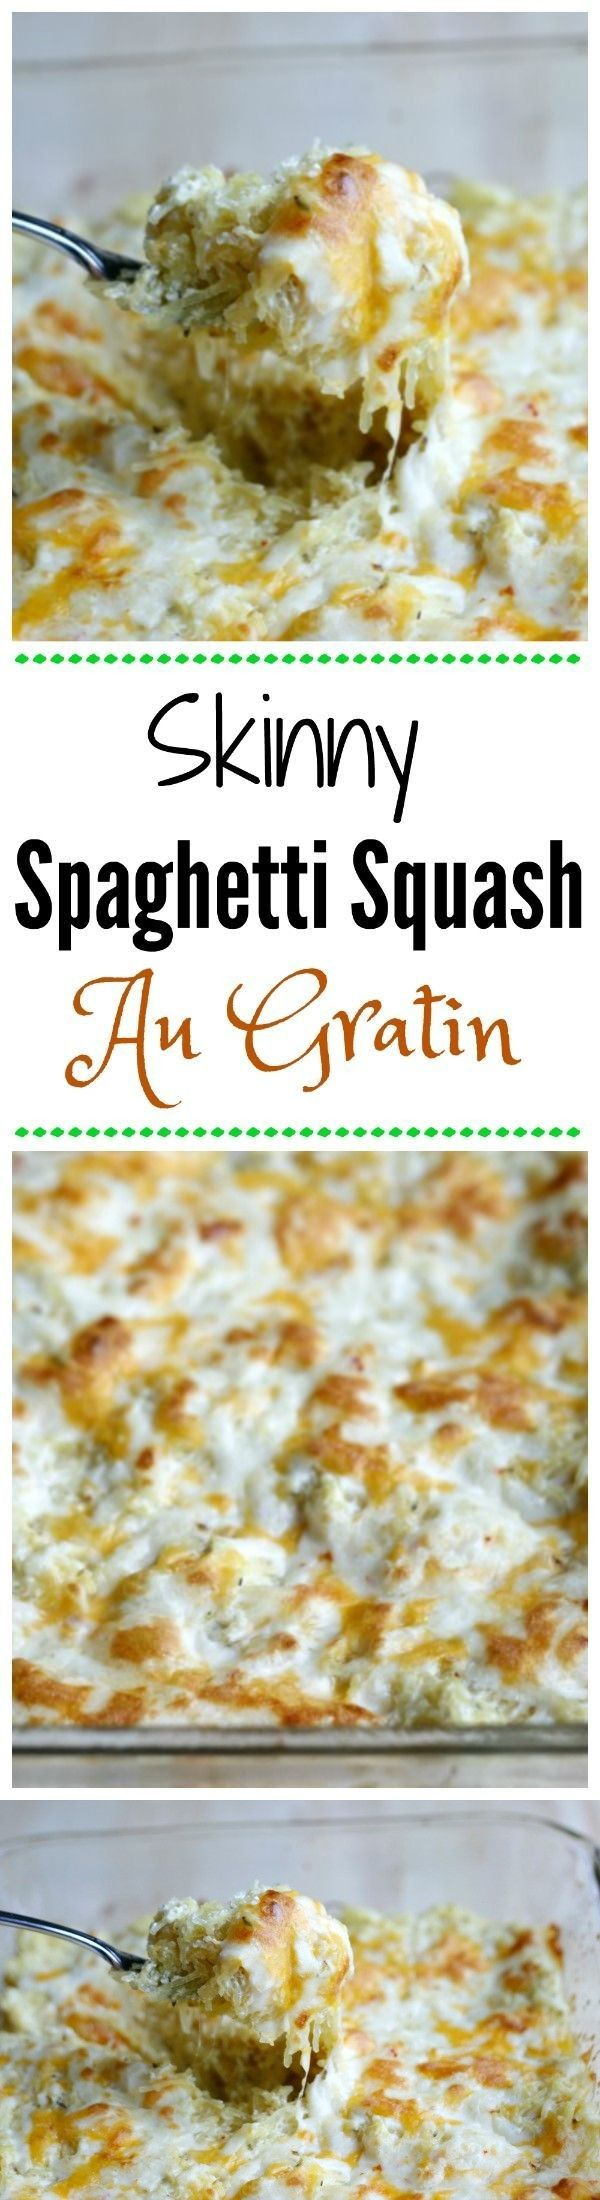 Skinny Spaghetti Squash Au Gratin